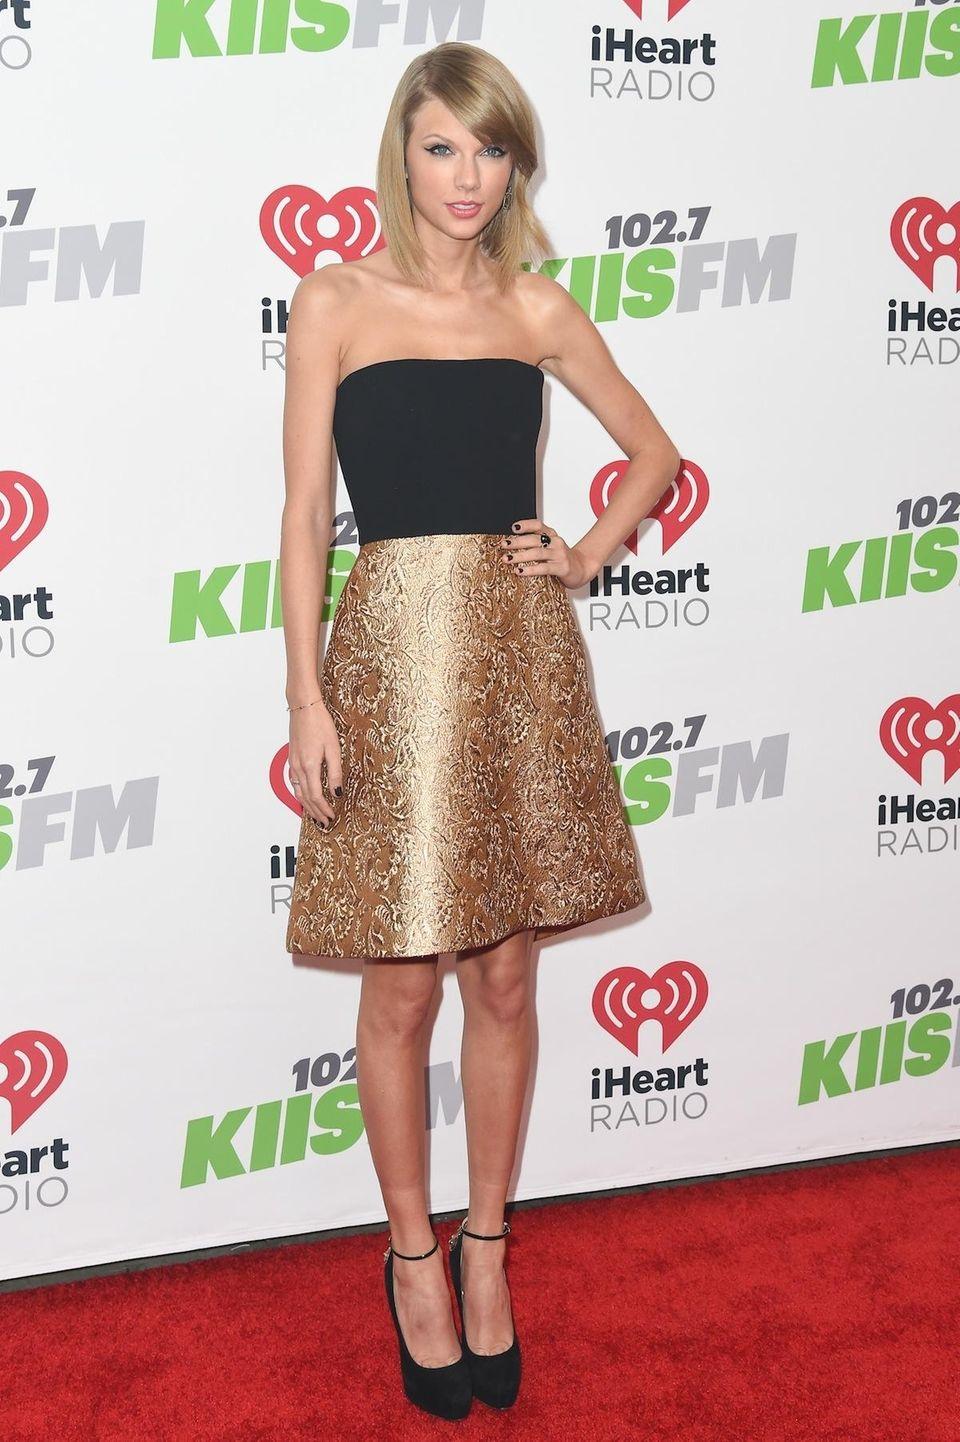 Taylor Swift at 2014 KIIS FM's Jingle Ball